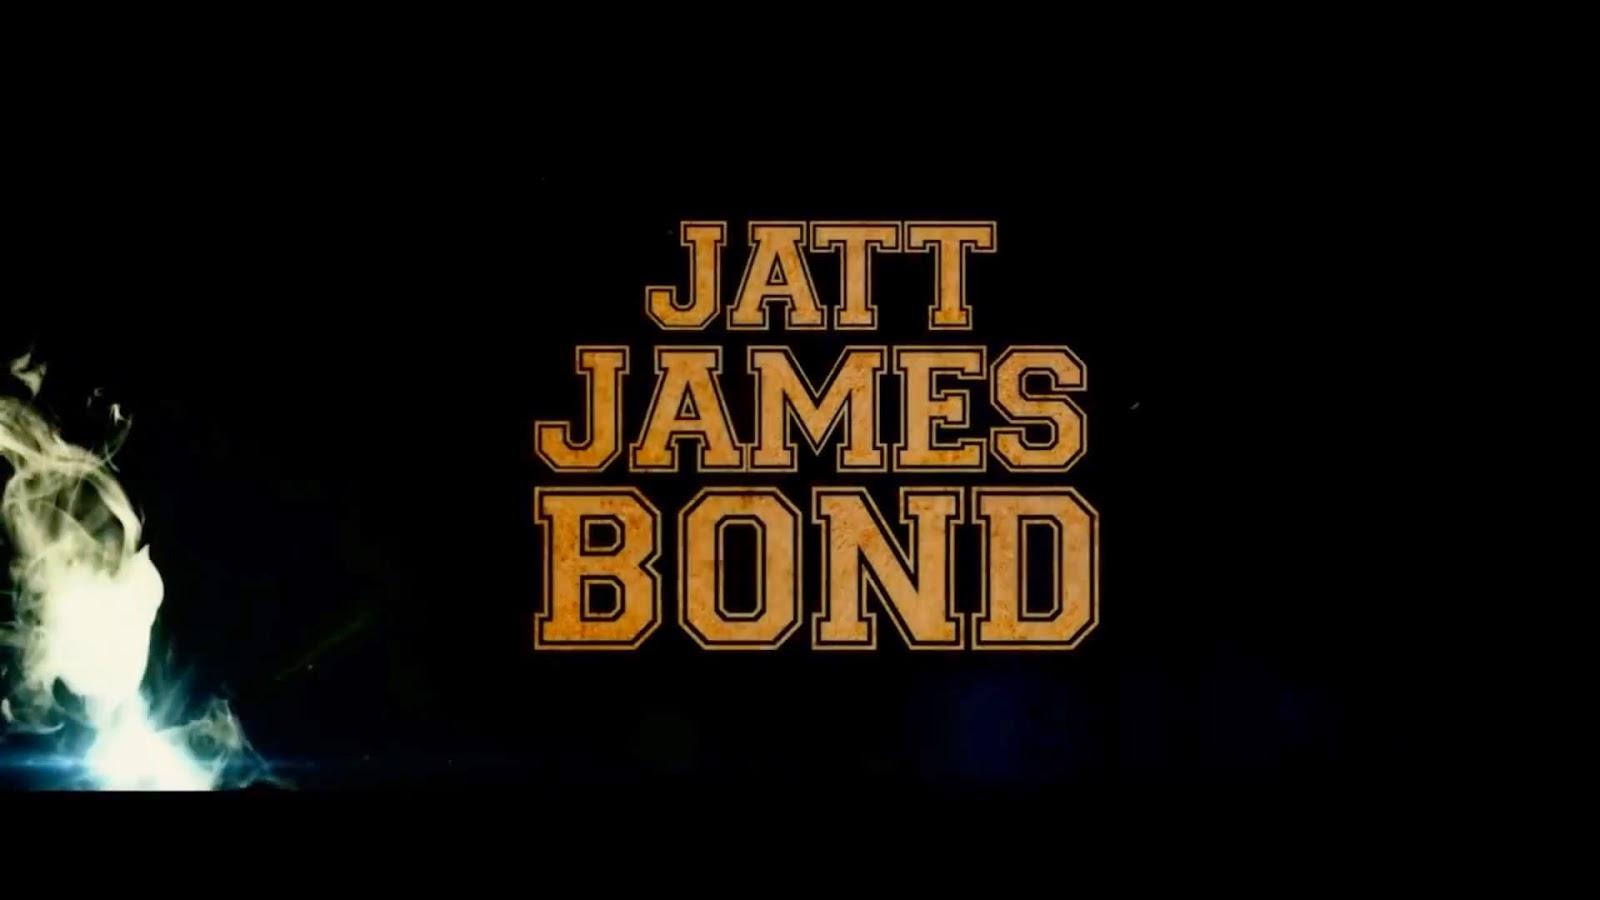 jatt james bond movie download hd punjabi